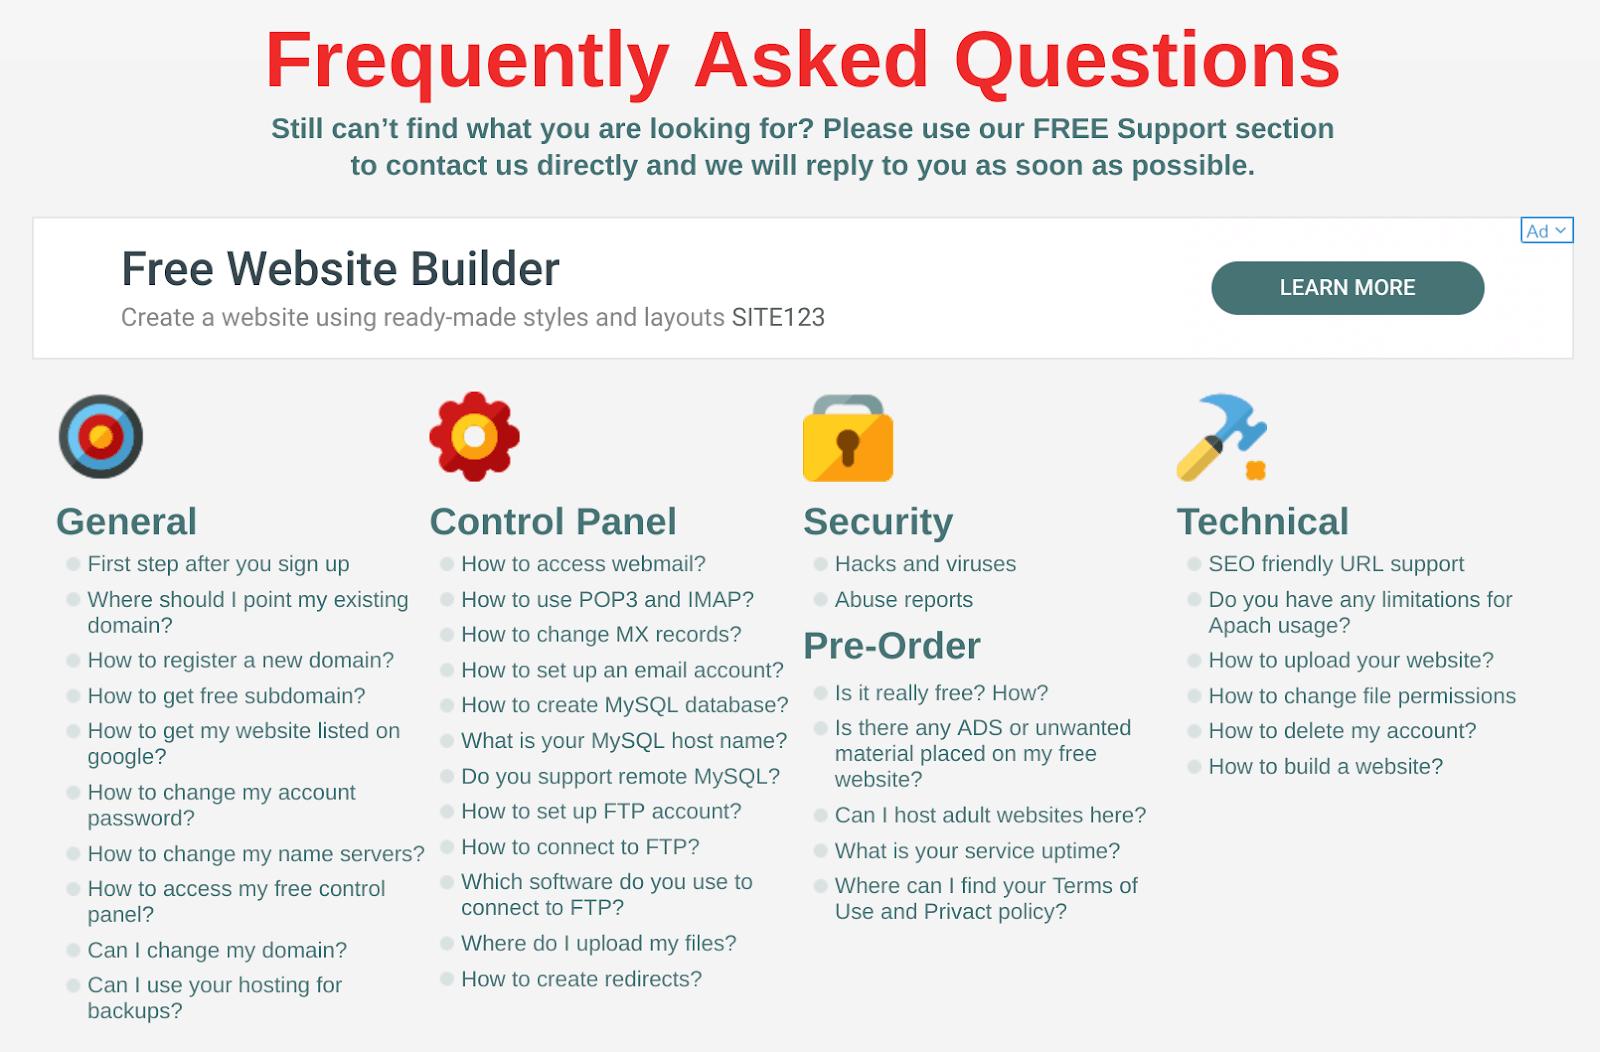 Free file hosting adult material